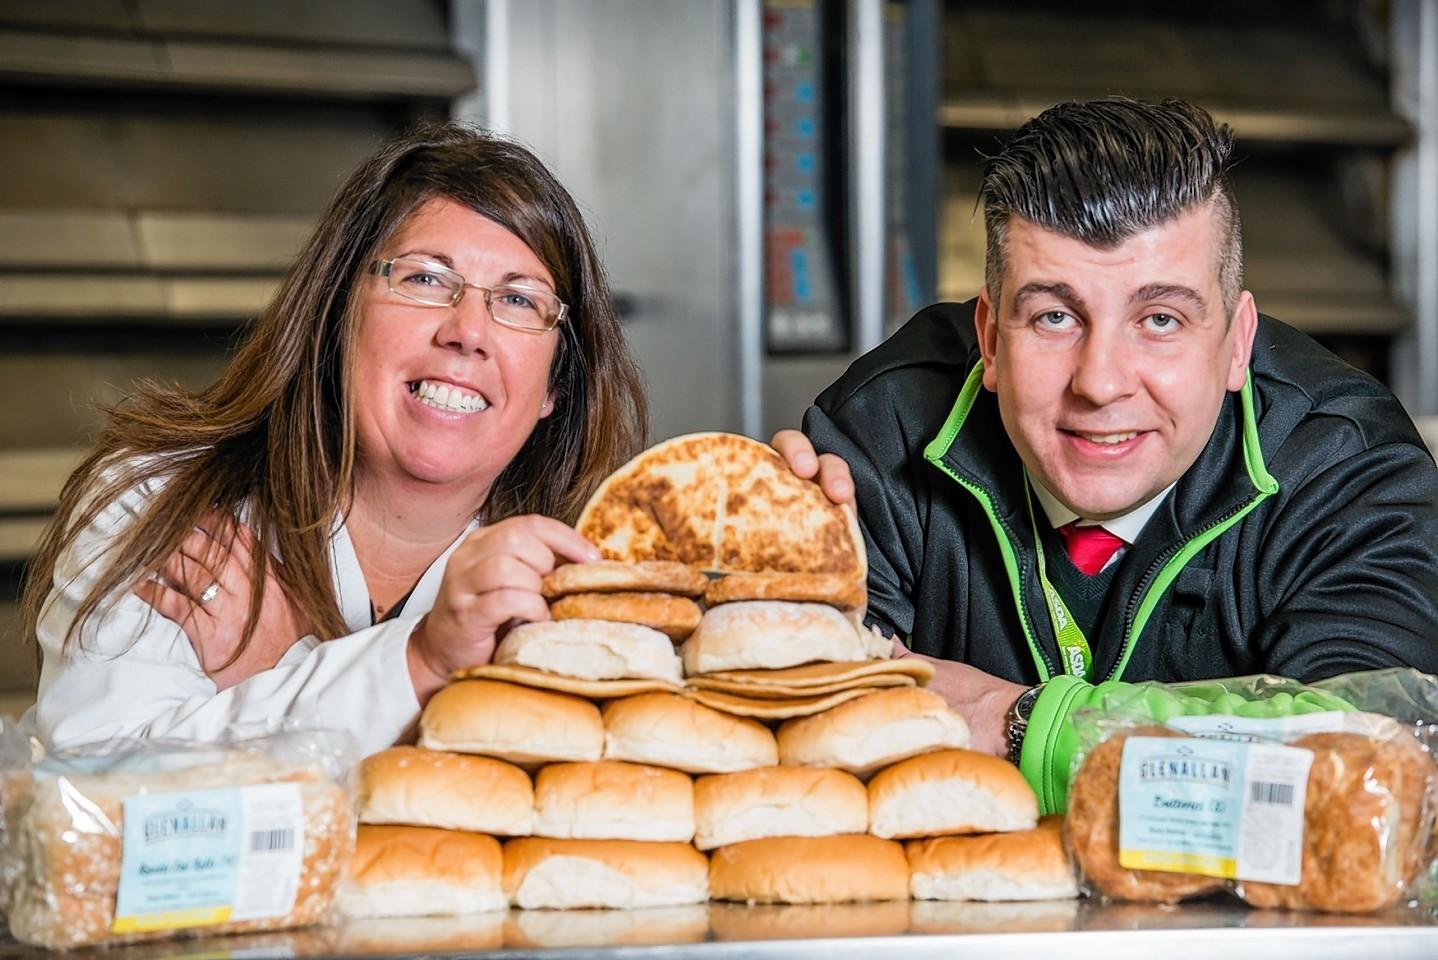 Asda Regional Buyer Brian O'Shea with Katrina Allan of Murdoch Allan Bakery